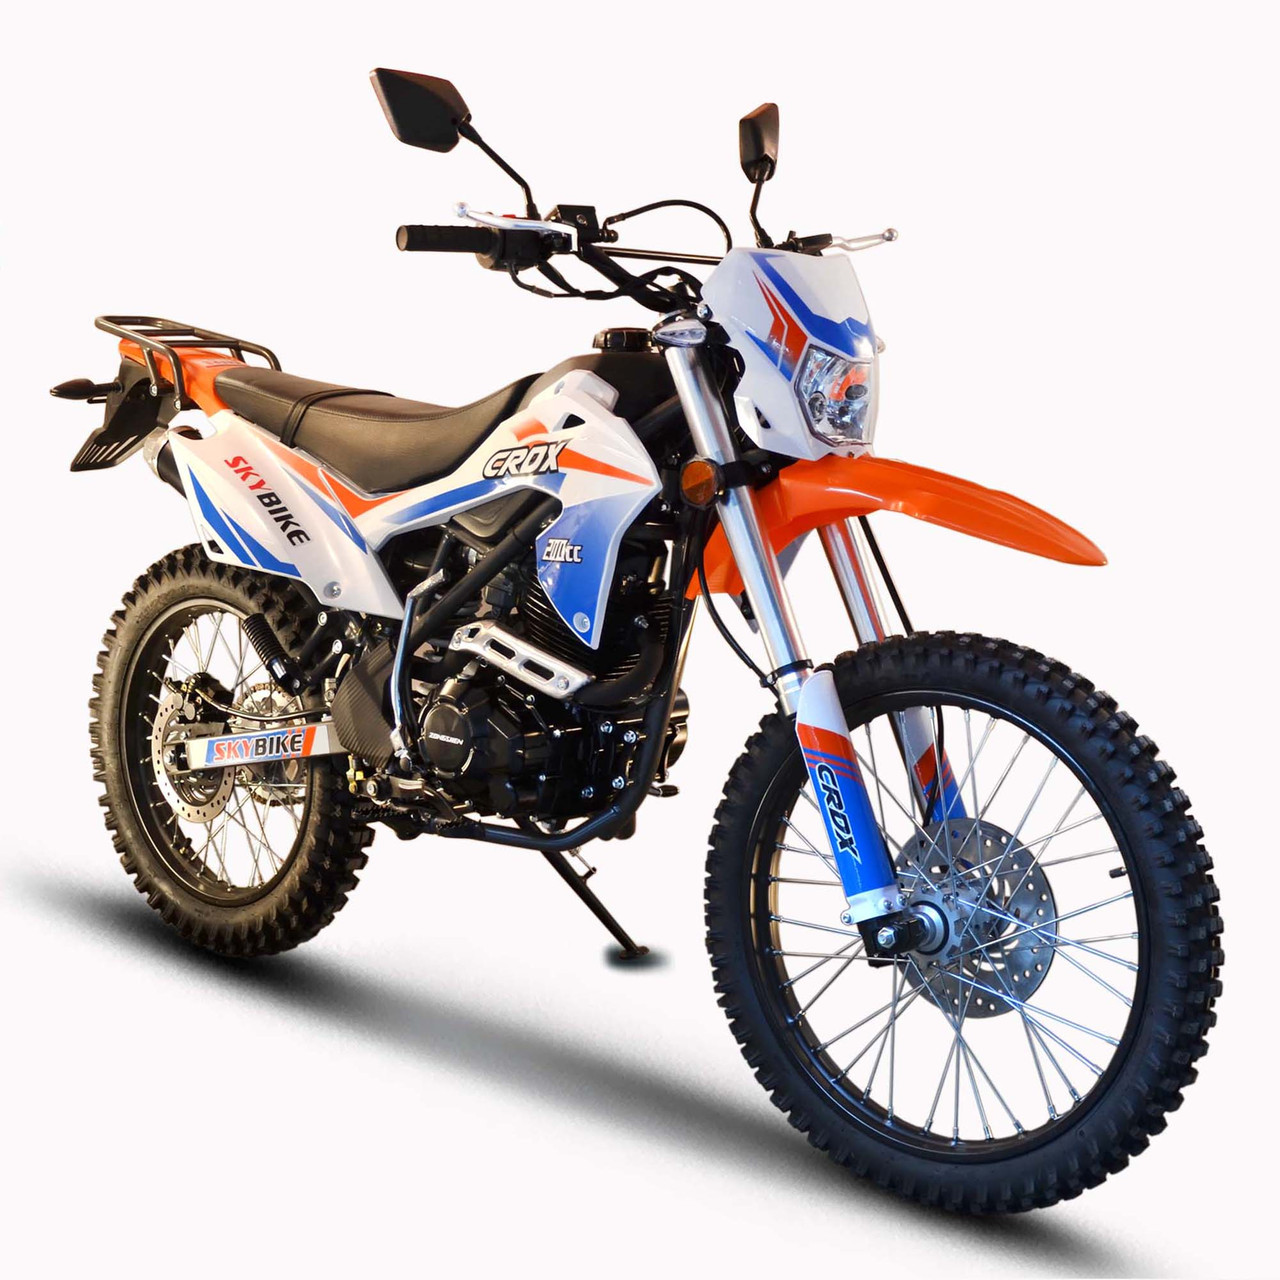 Мотоцикл Skybike CRDX 200 (21-18) Бело-оранжевый